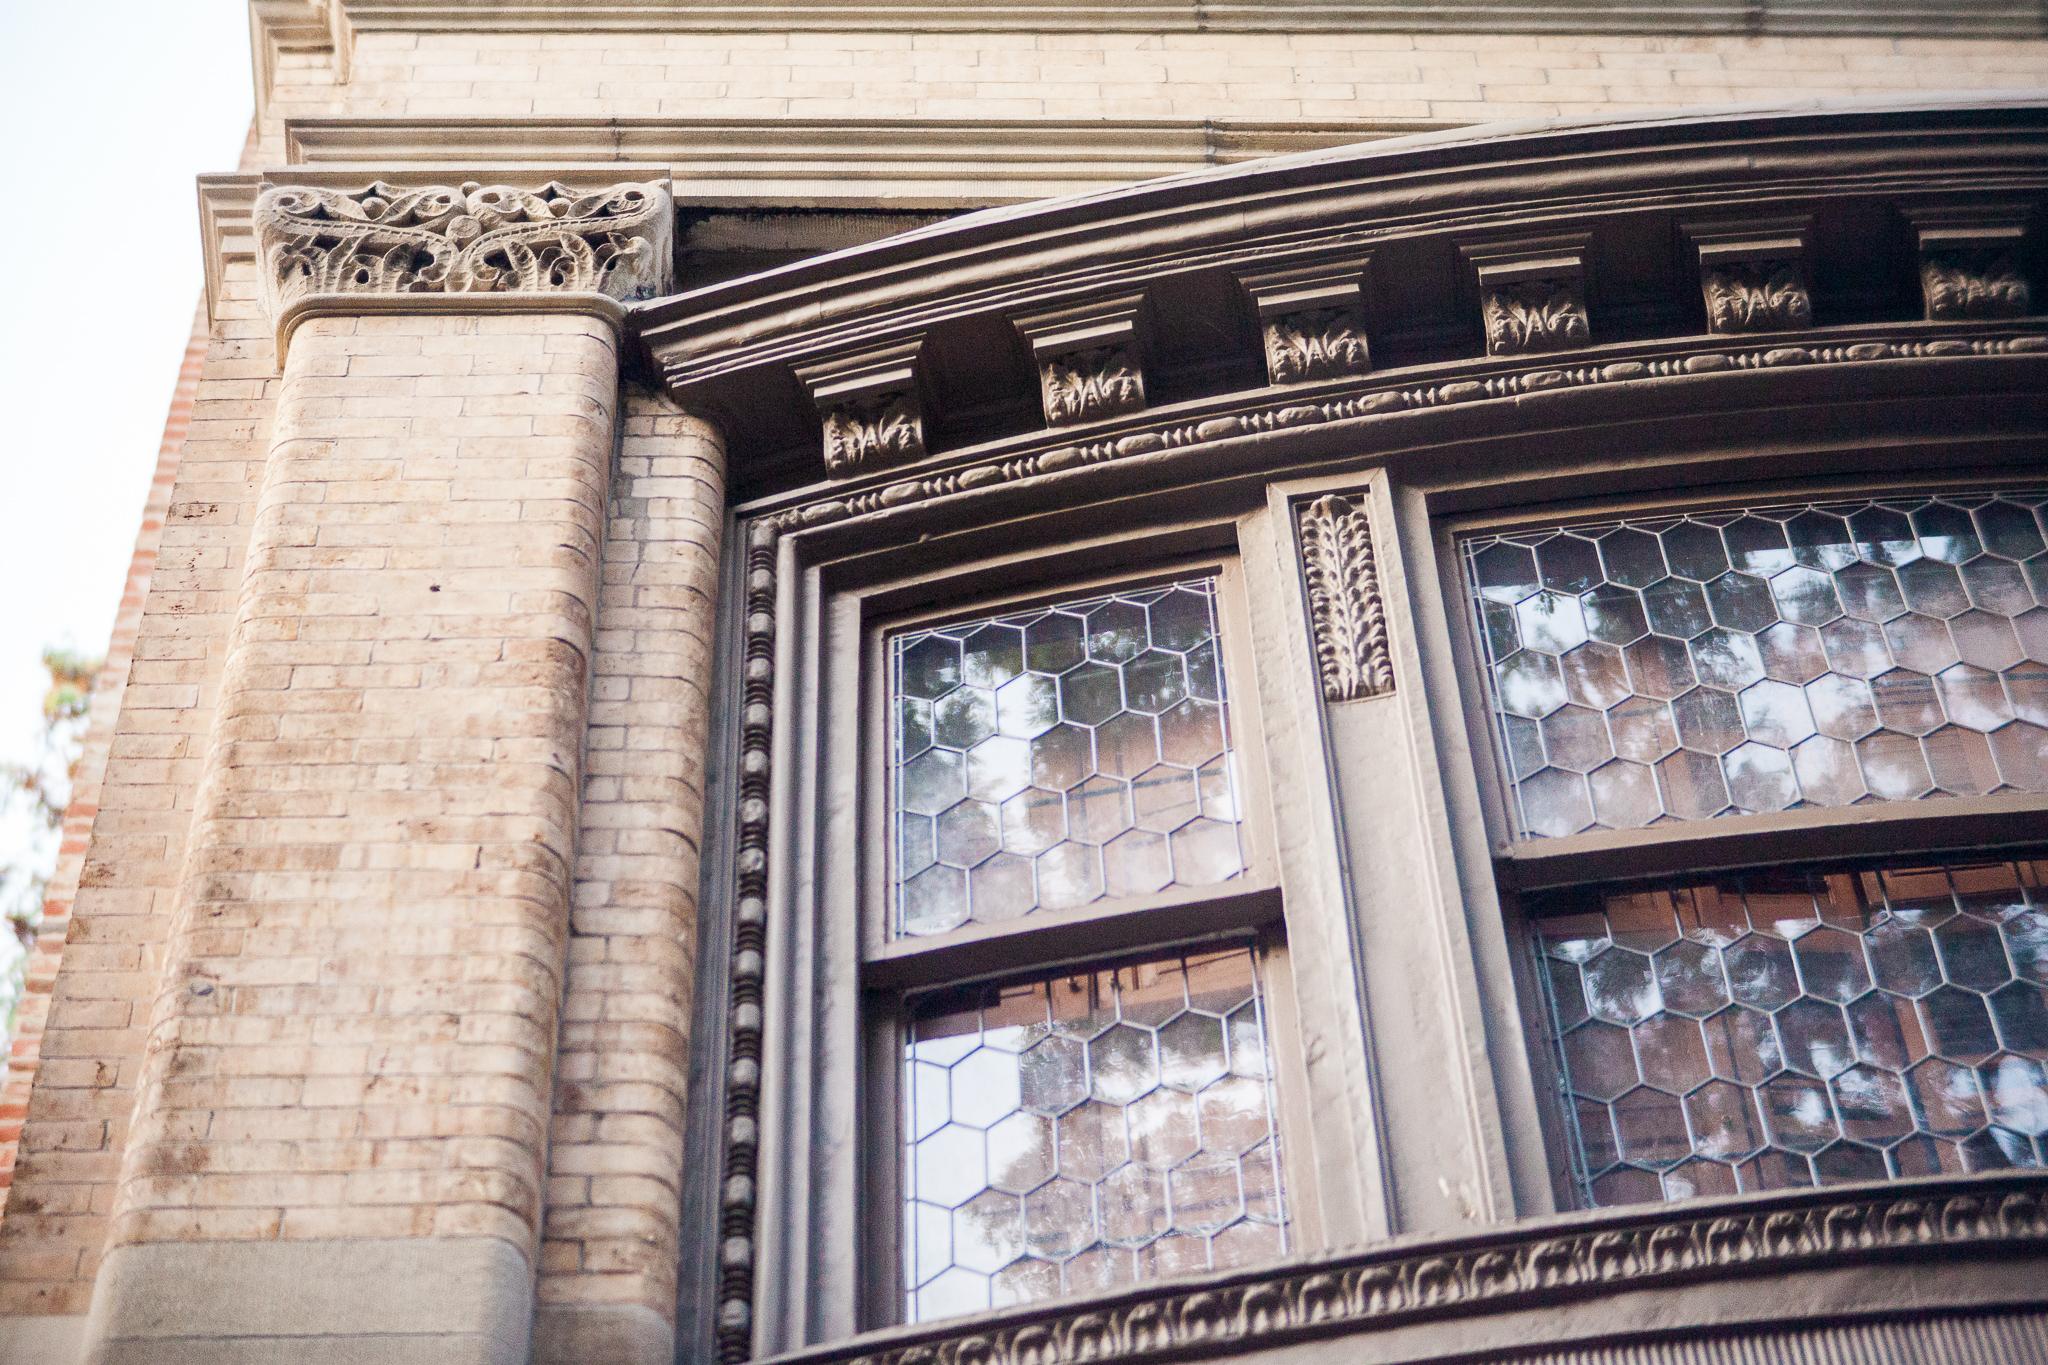 whomstudio_kristin-luks-architecture-nyc_0020-web.jpg